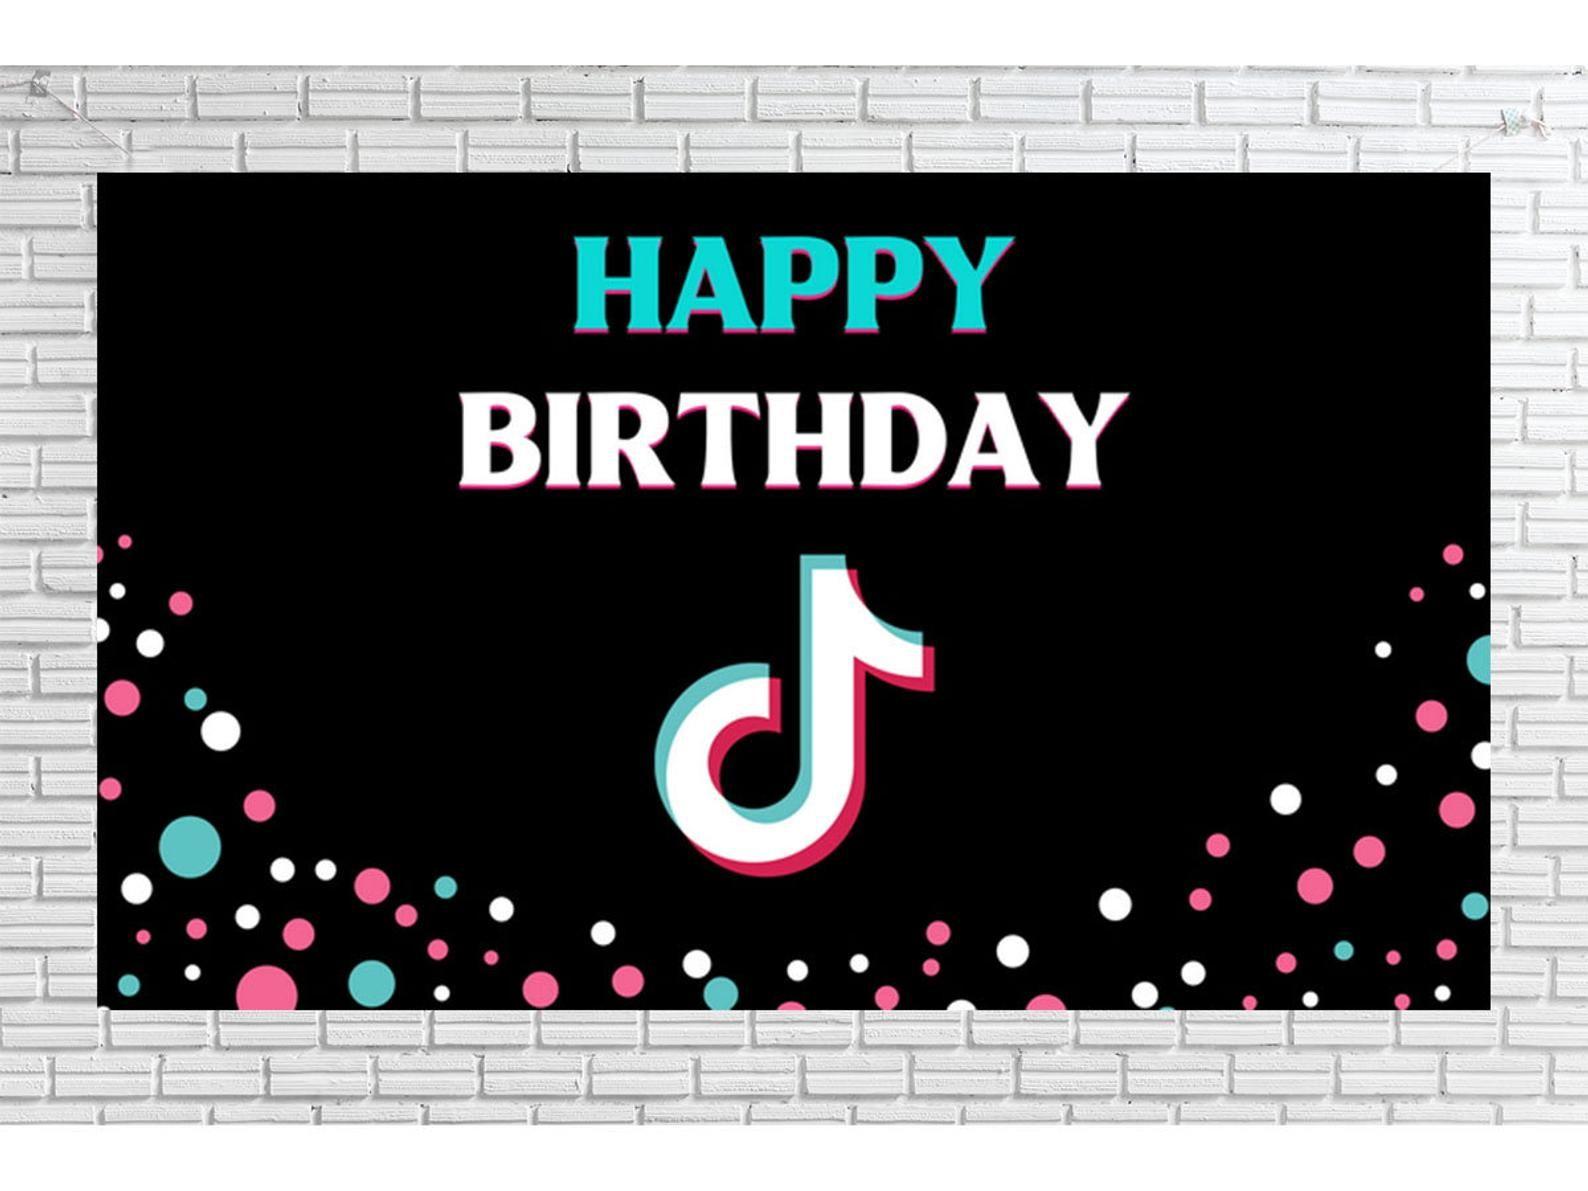 Tik Tok Birthday Party Decorations Tiktok Party Sign Happy Etsy In 2021 Birthday Party Decorations Party Signs Birthday Backdrop